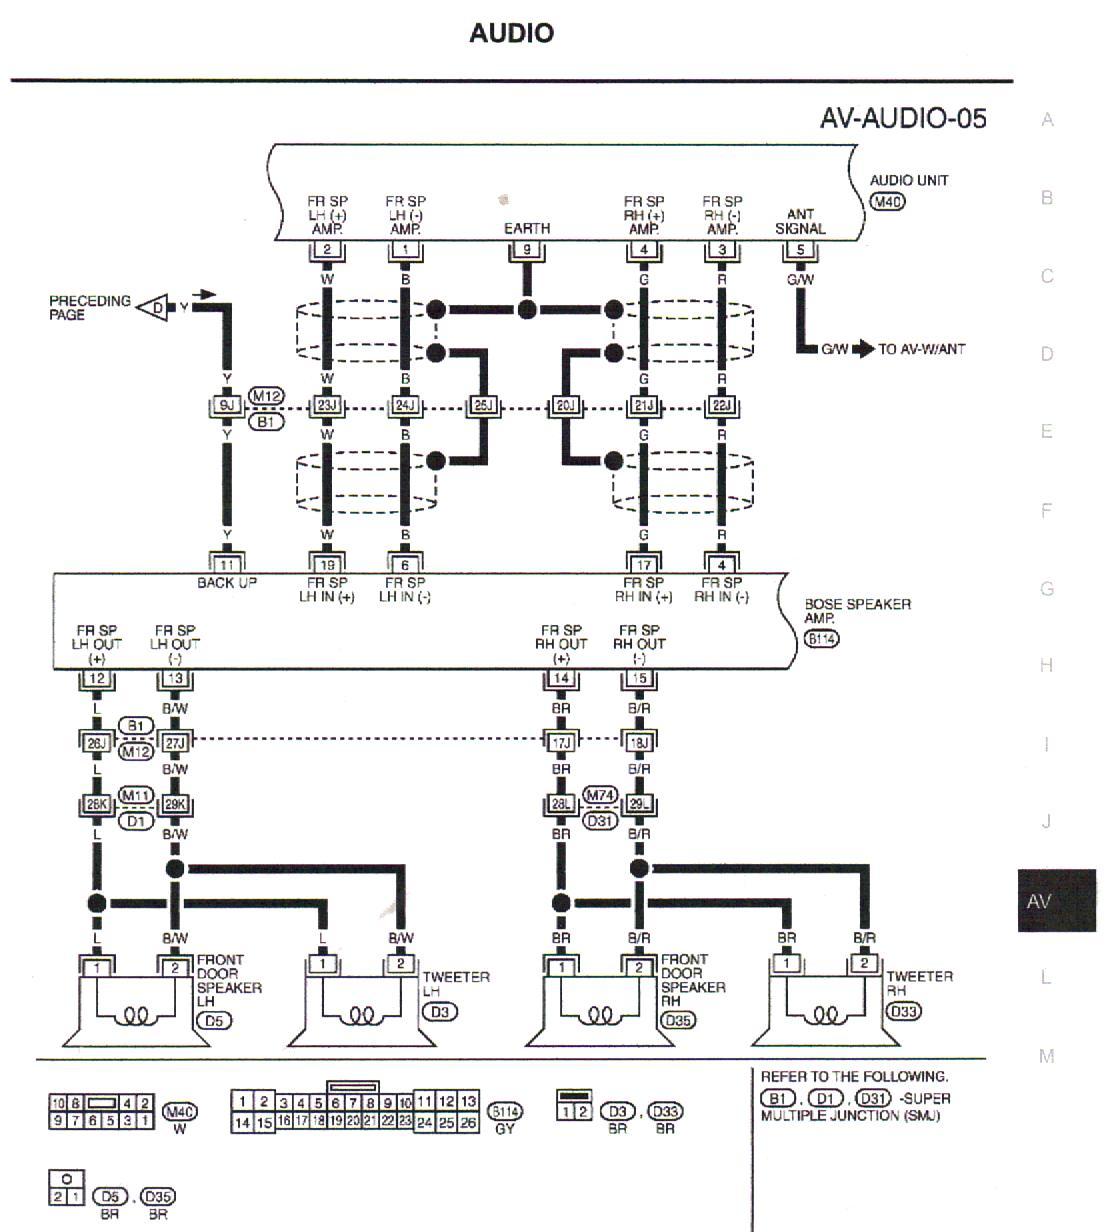 Infiniti Qx56 Speaker Wiring Diagram Data Schema Fuses Parts 2004 Dtr Relay Diagrams 2005